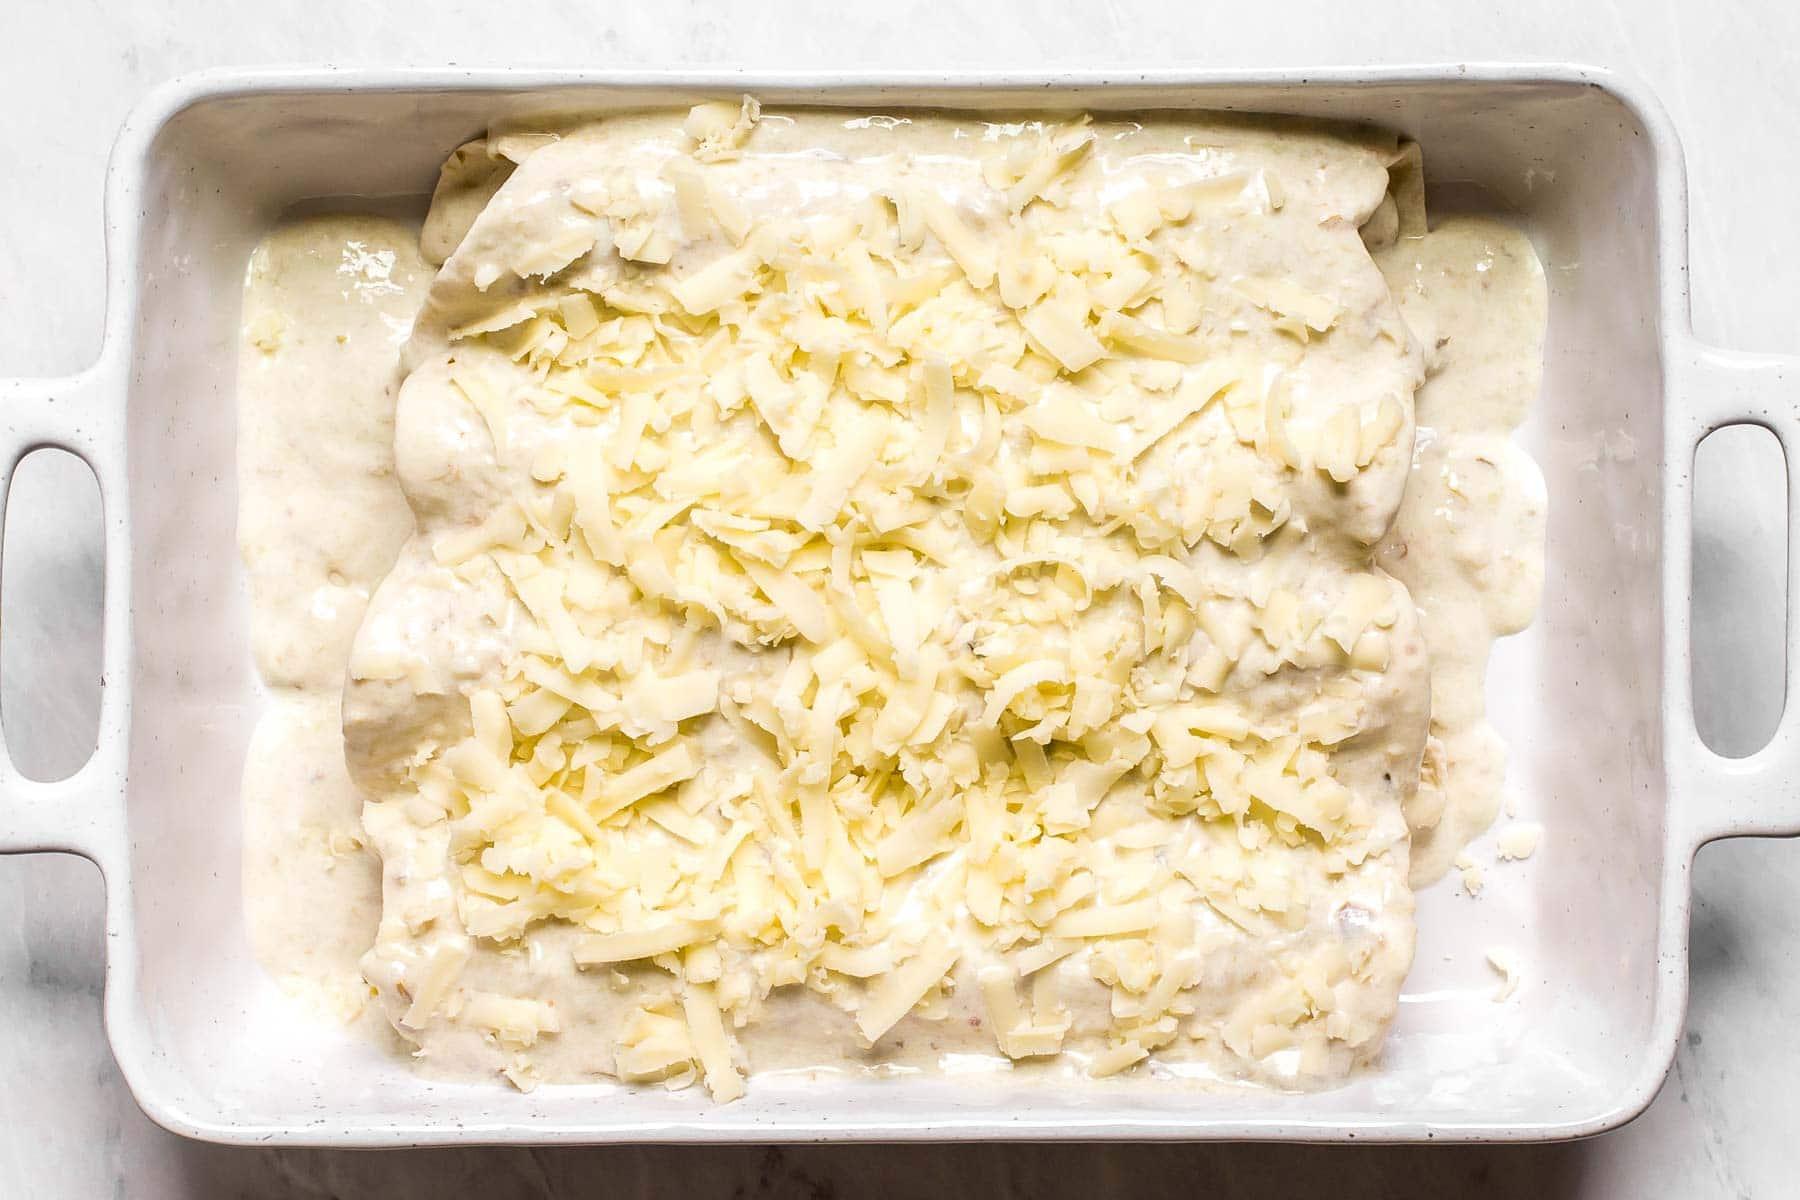 Creamy enchiladas before baking.